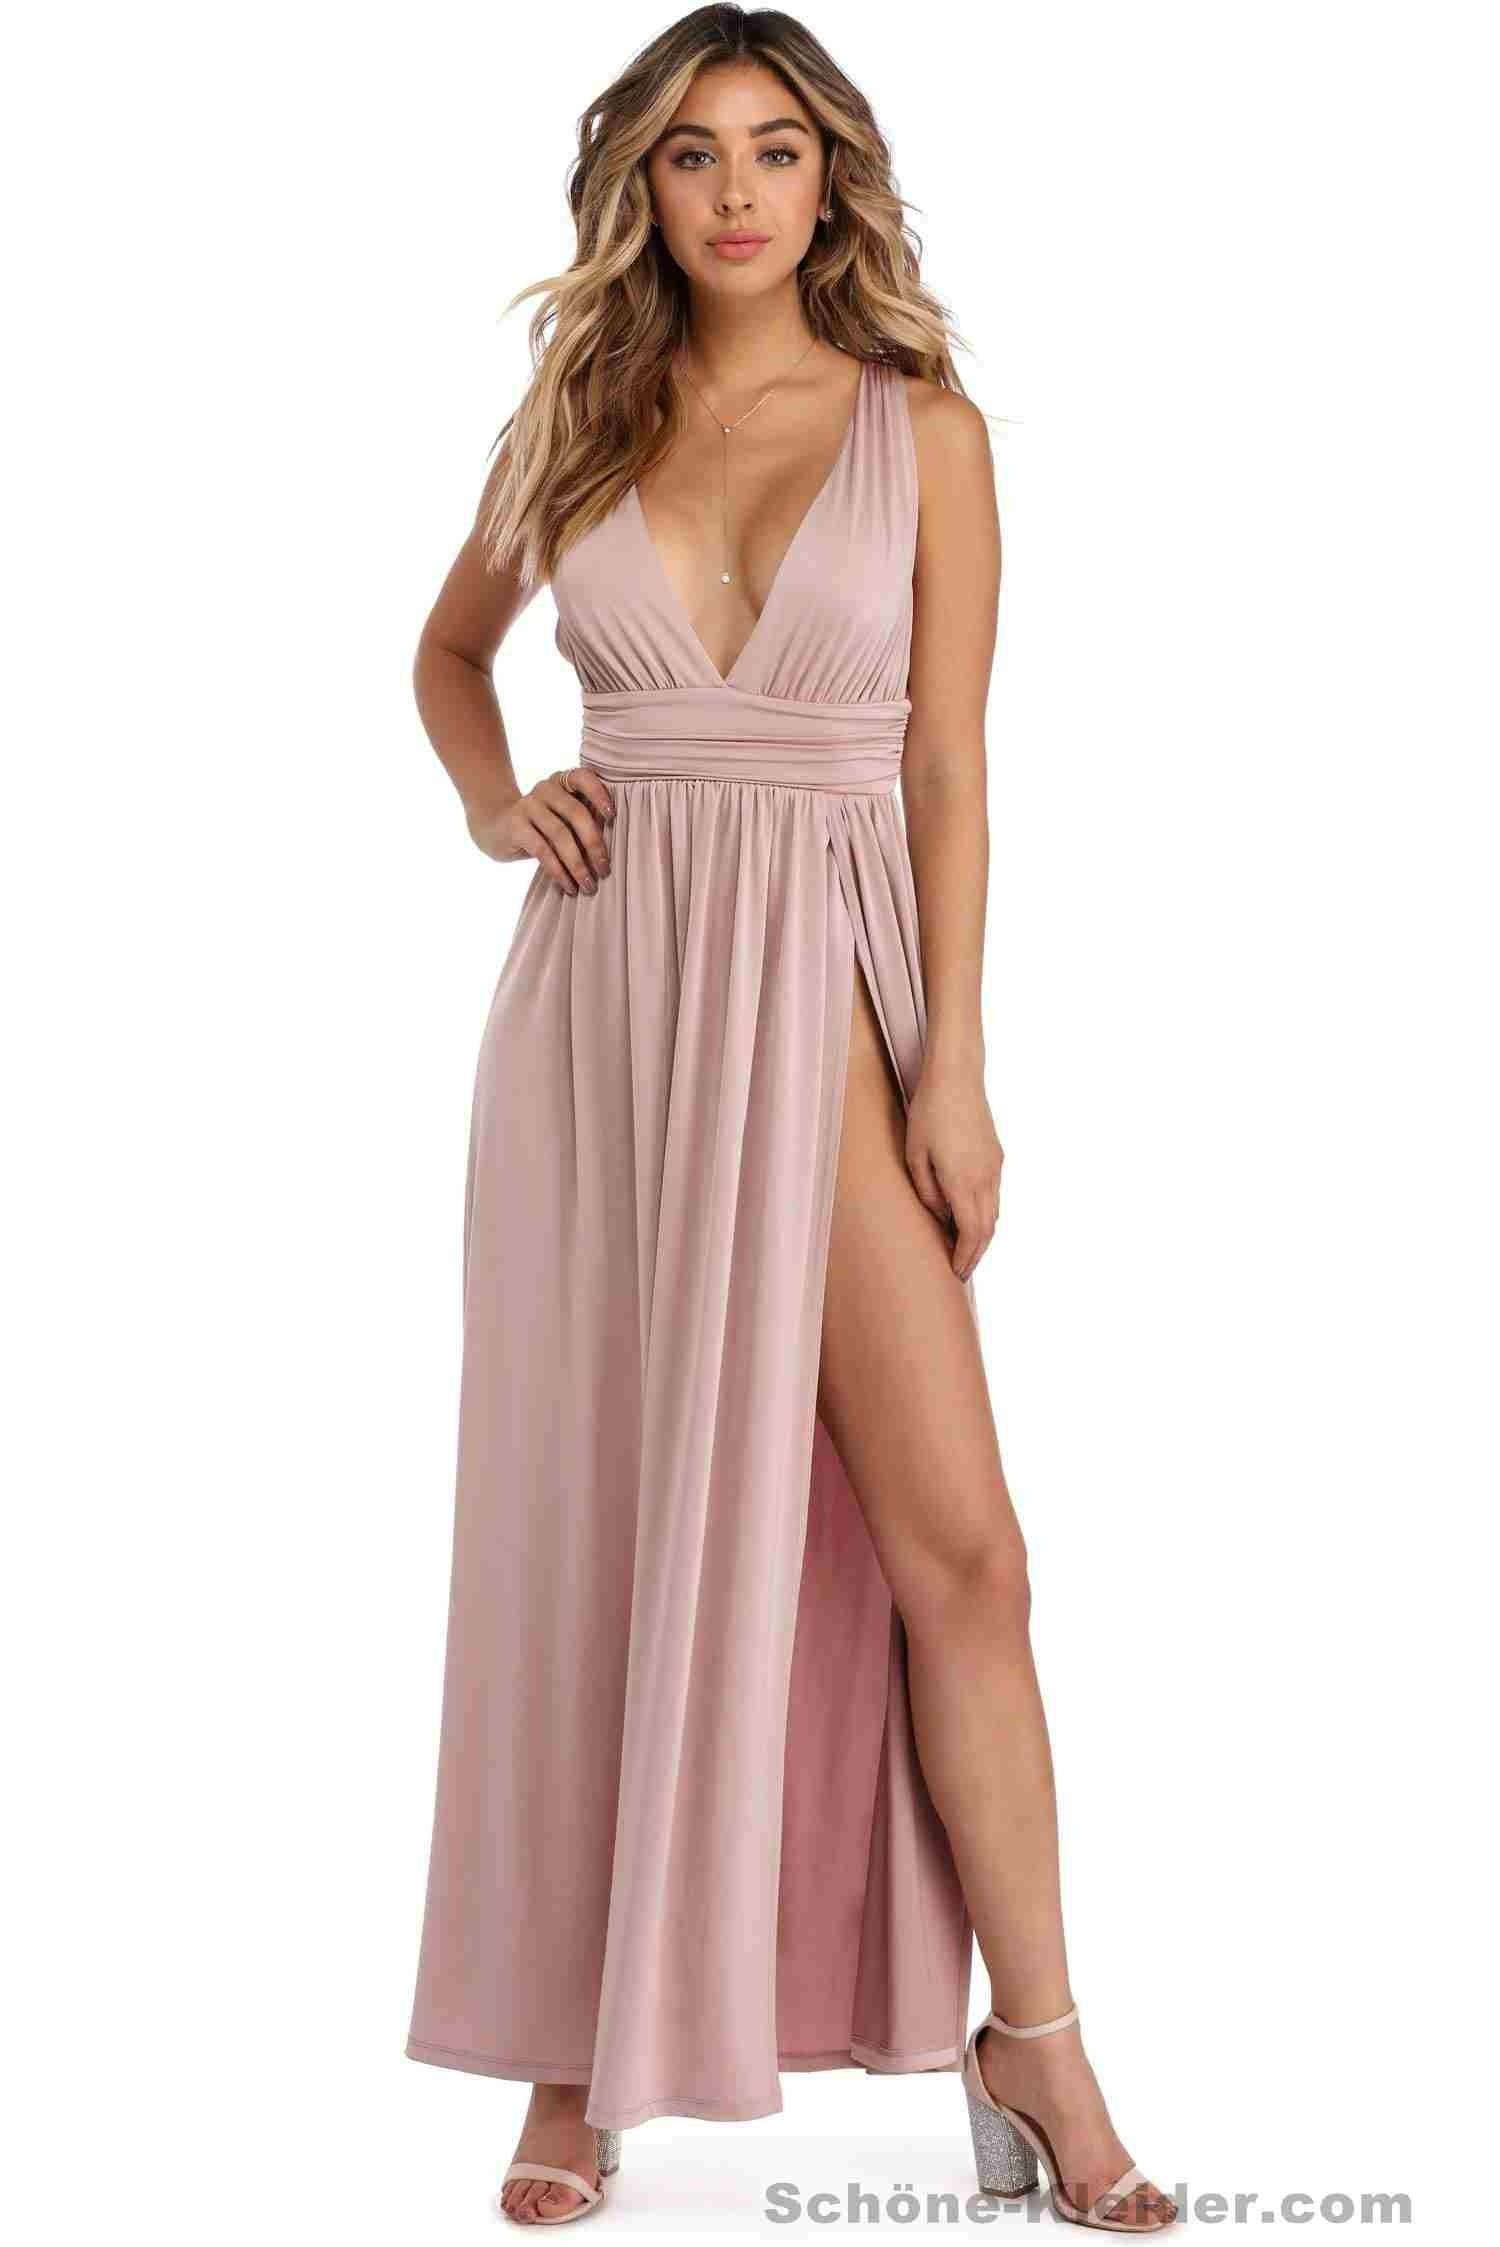 20 Top Lange Fließende Kleider Design - Abendkleid